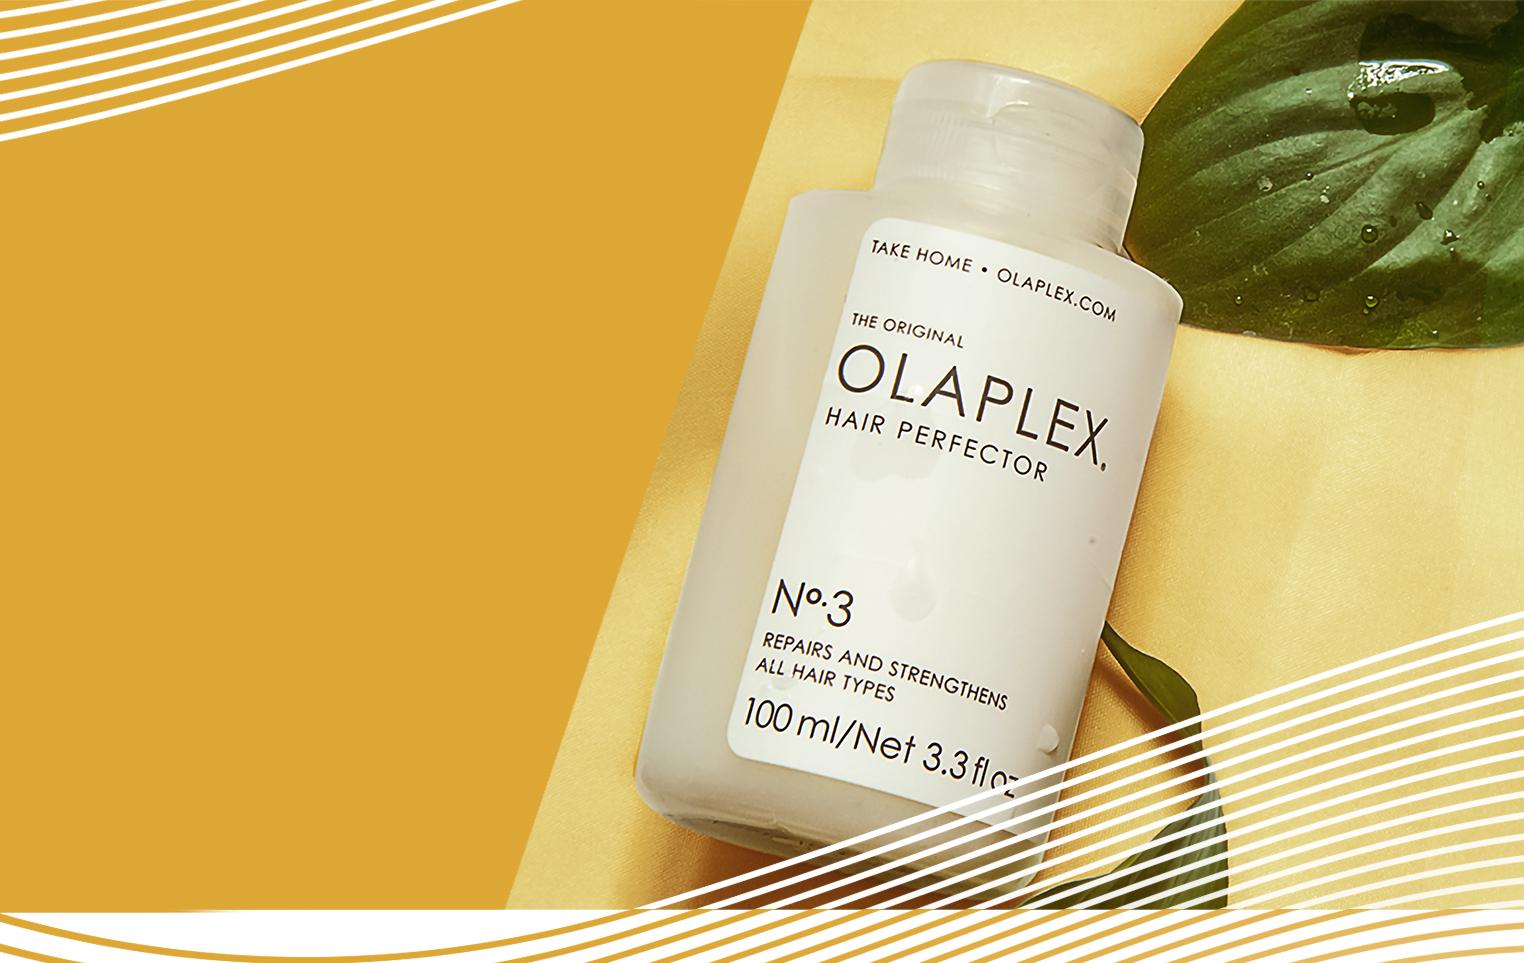 Olaplex produkcija